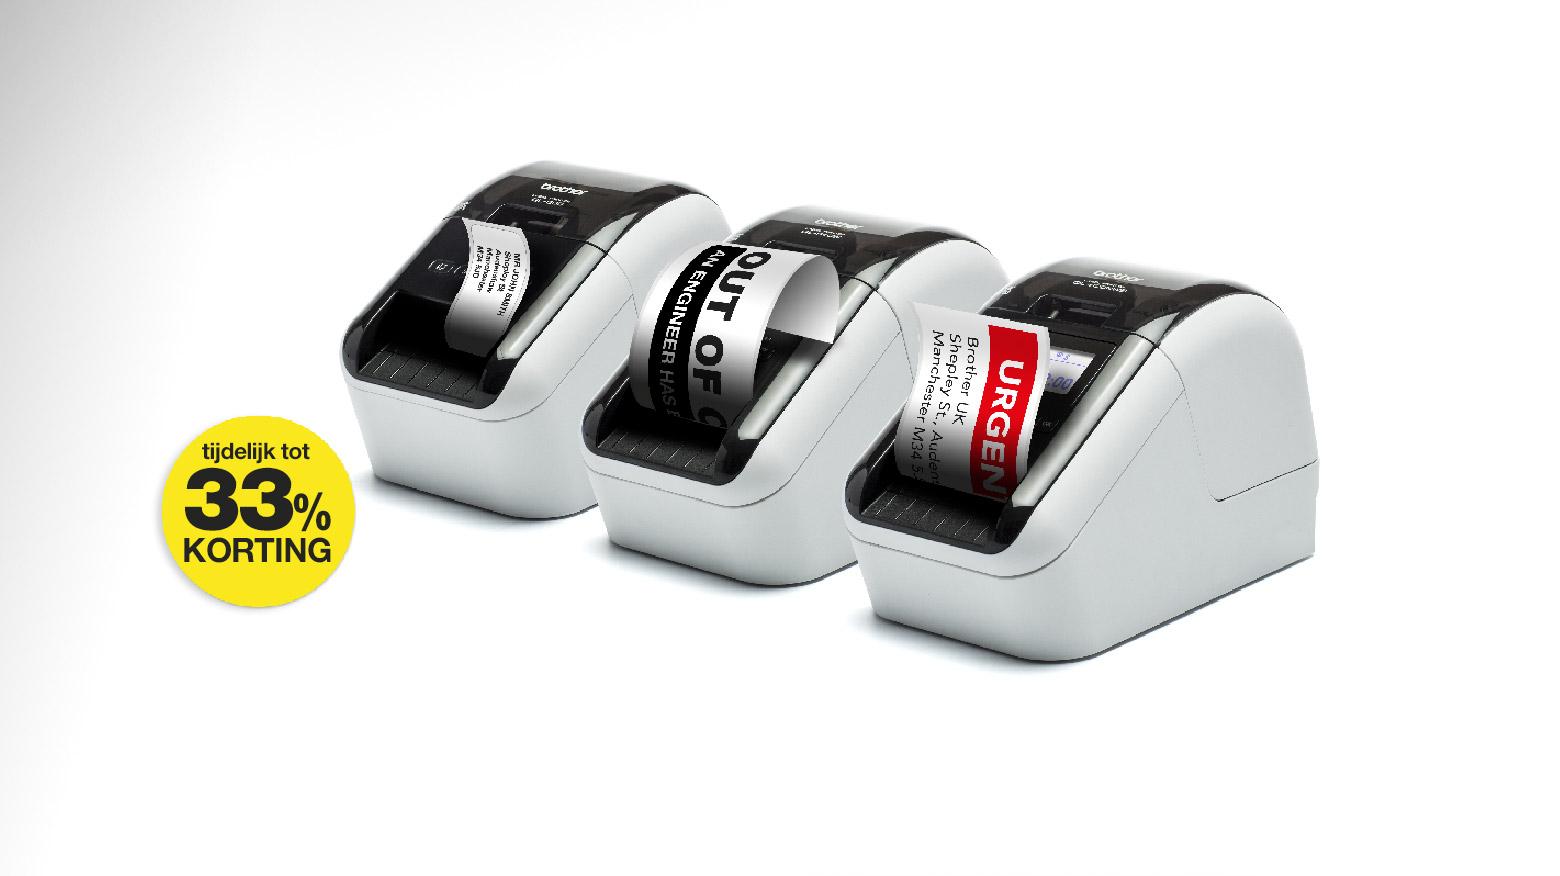 promobanner-labelprinters-1560x876_0919